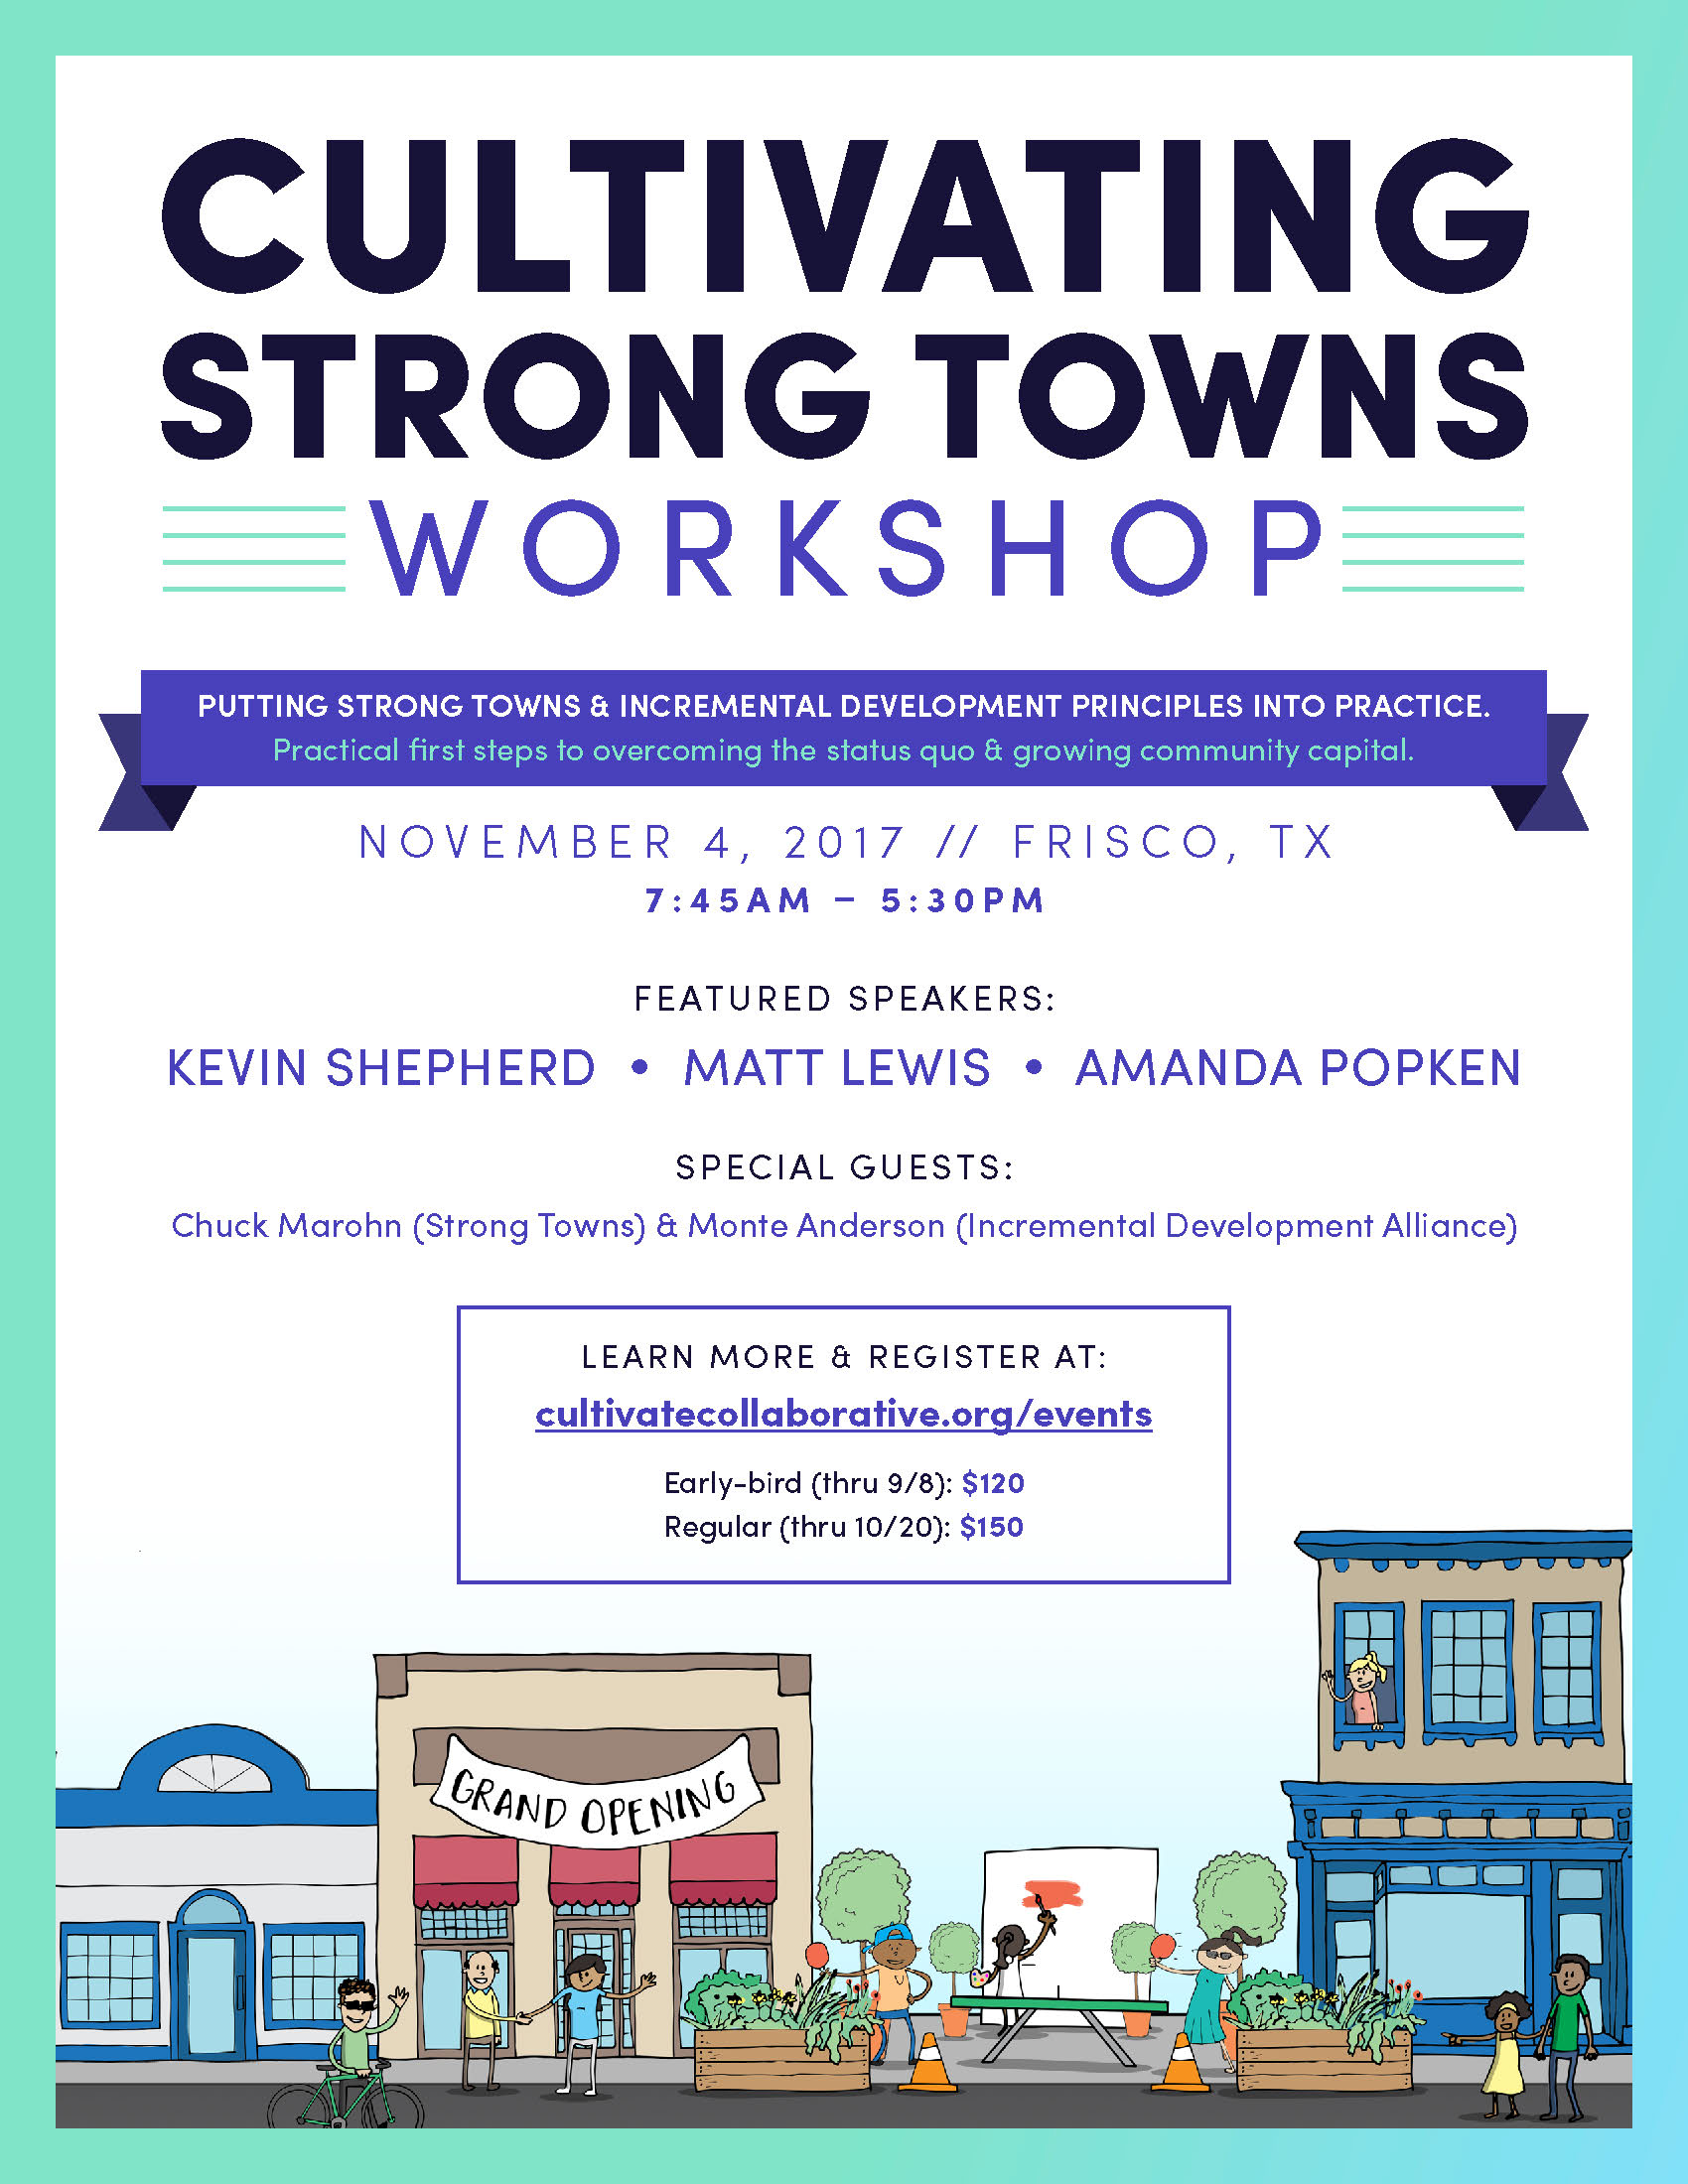 Cultivating Strong Towns Workshop Nov 4 2017